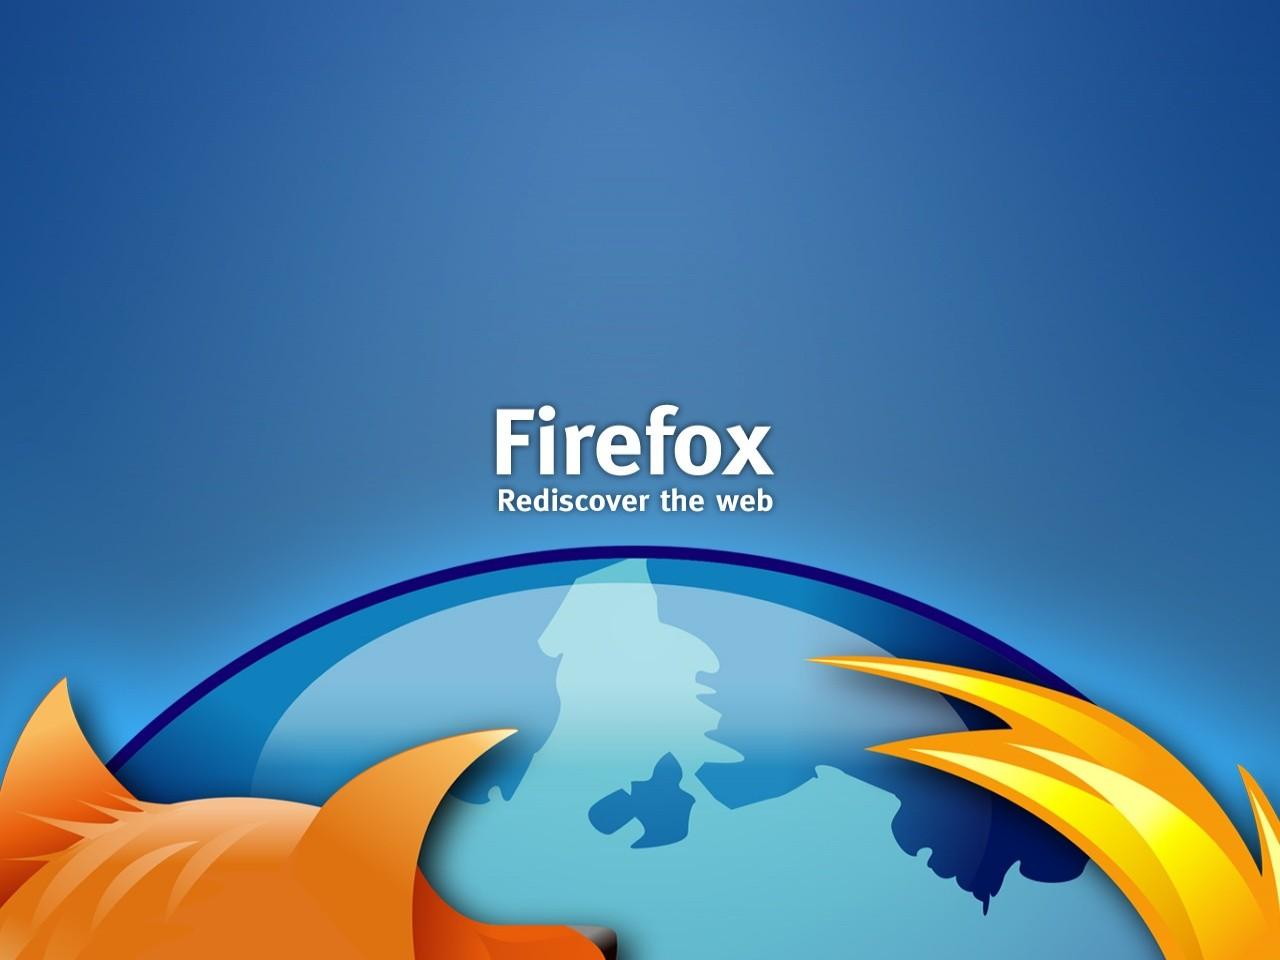 General 1280x960 Mozilla Firefox logo open source Browser fox